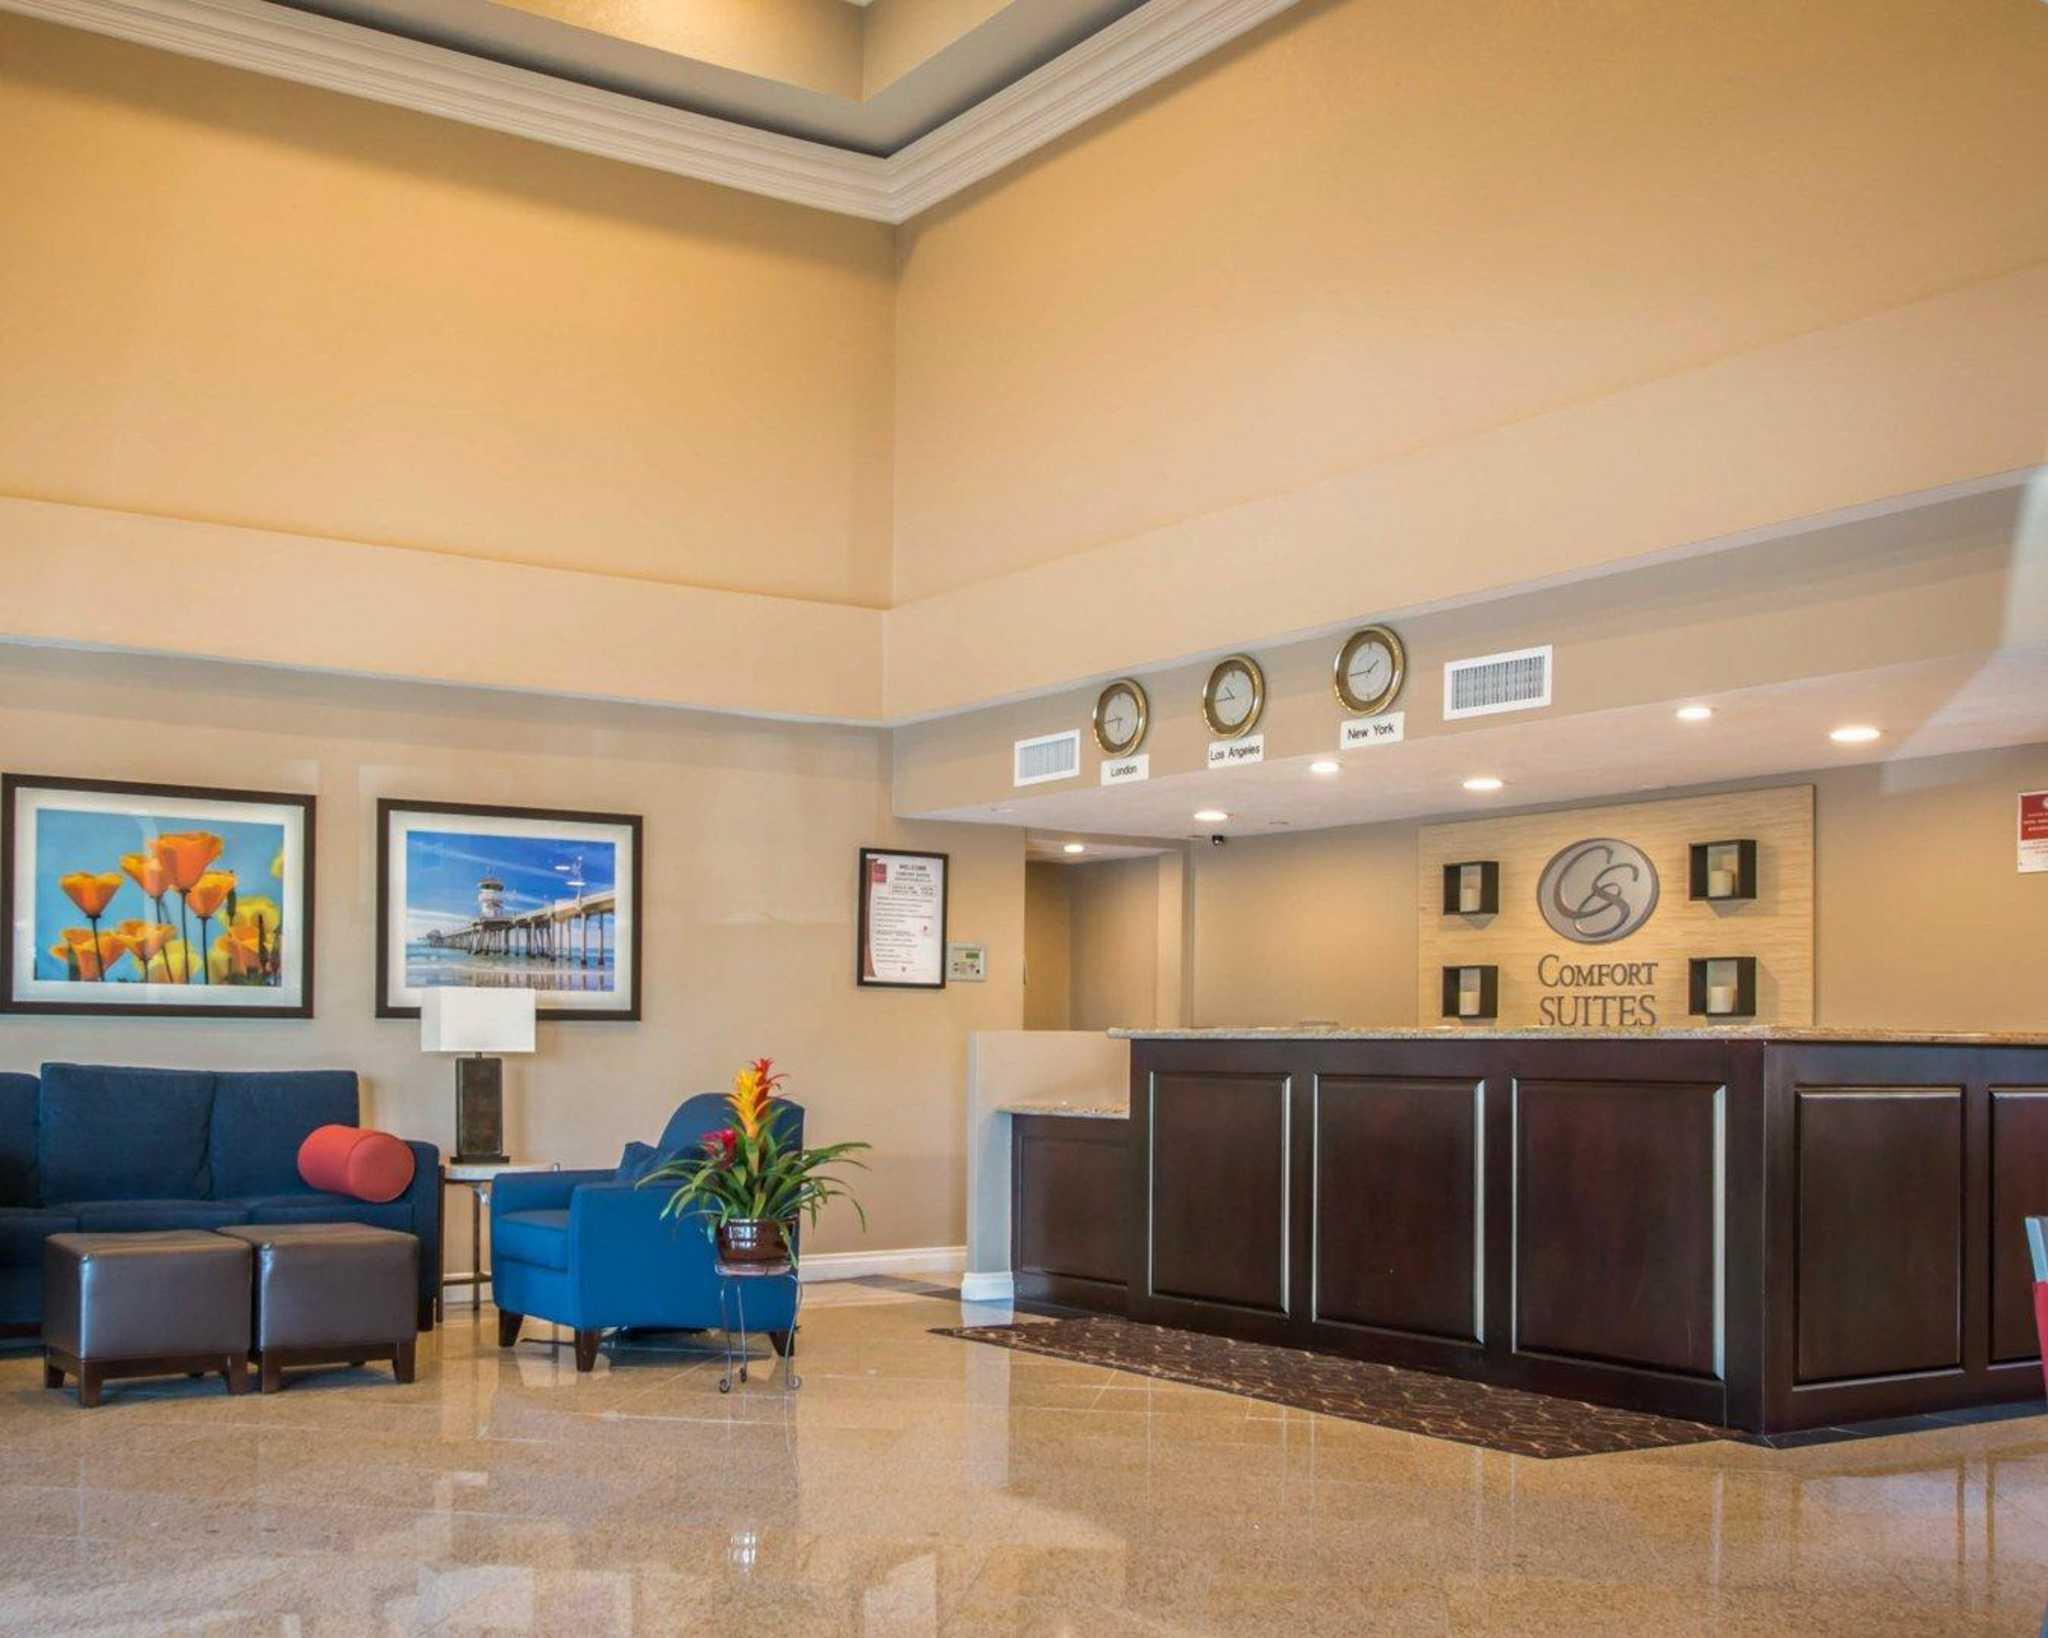 Comfort Suites Huntington Beach image 12